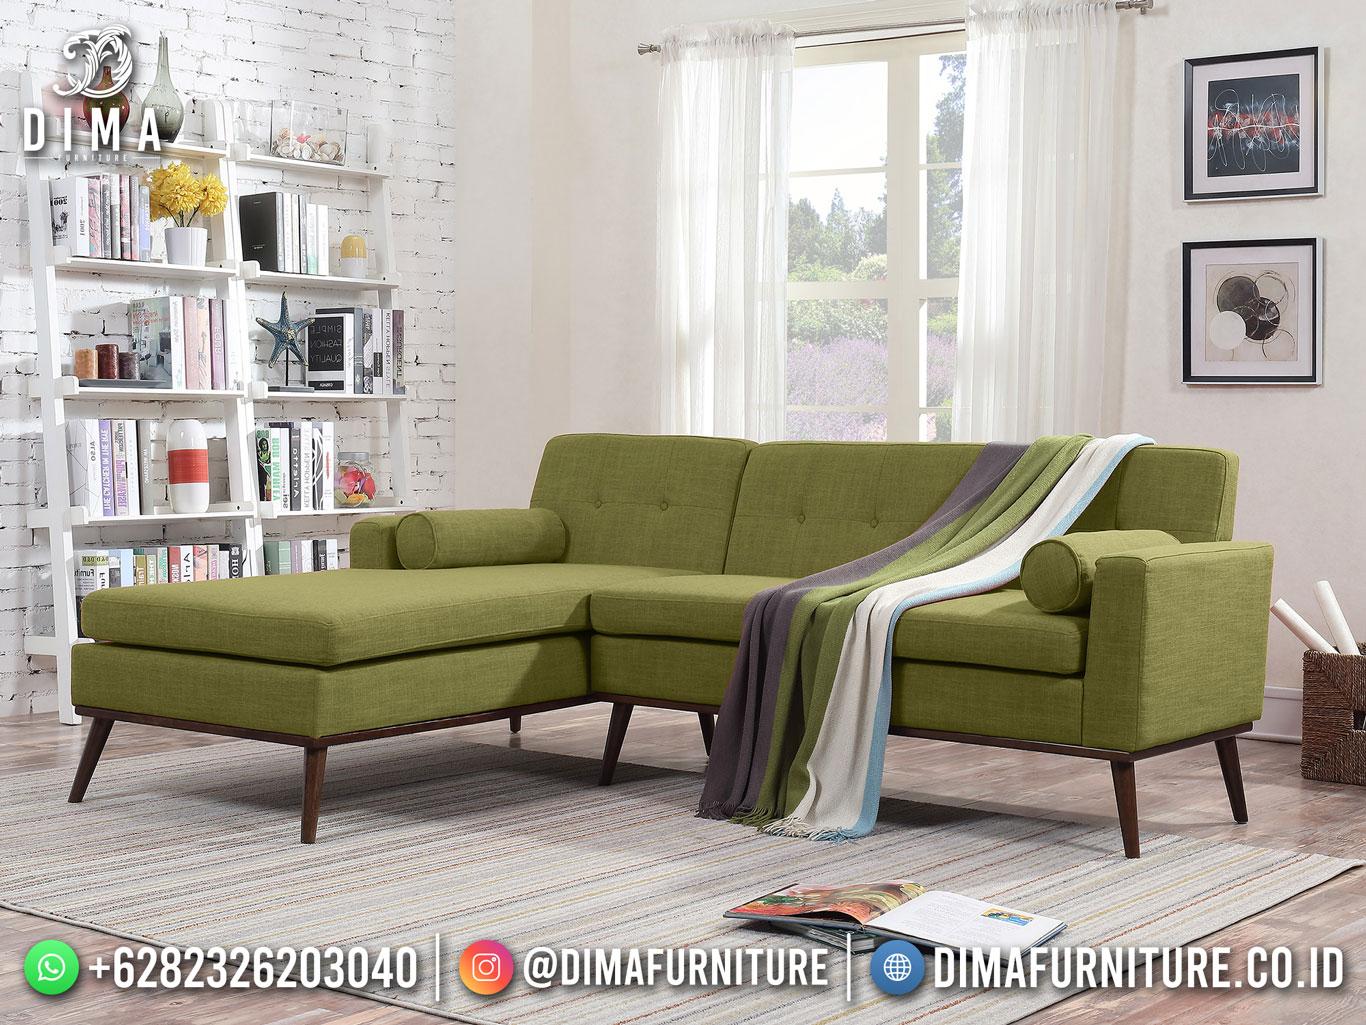 The Great living Room Sofa Tamu Minimalis Natural jati Perhutani TTJ-1788